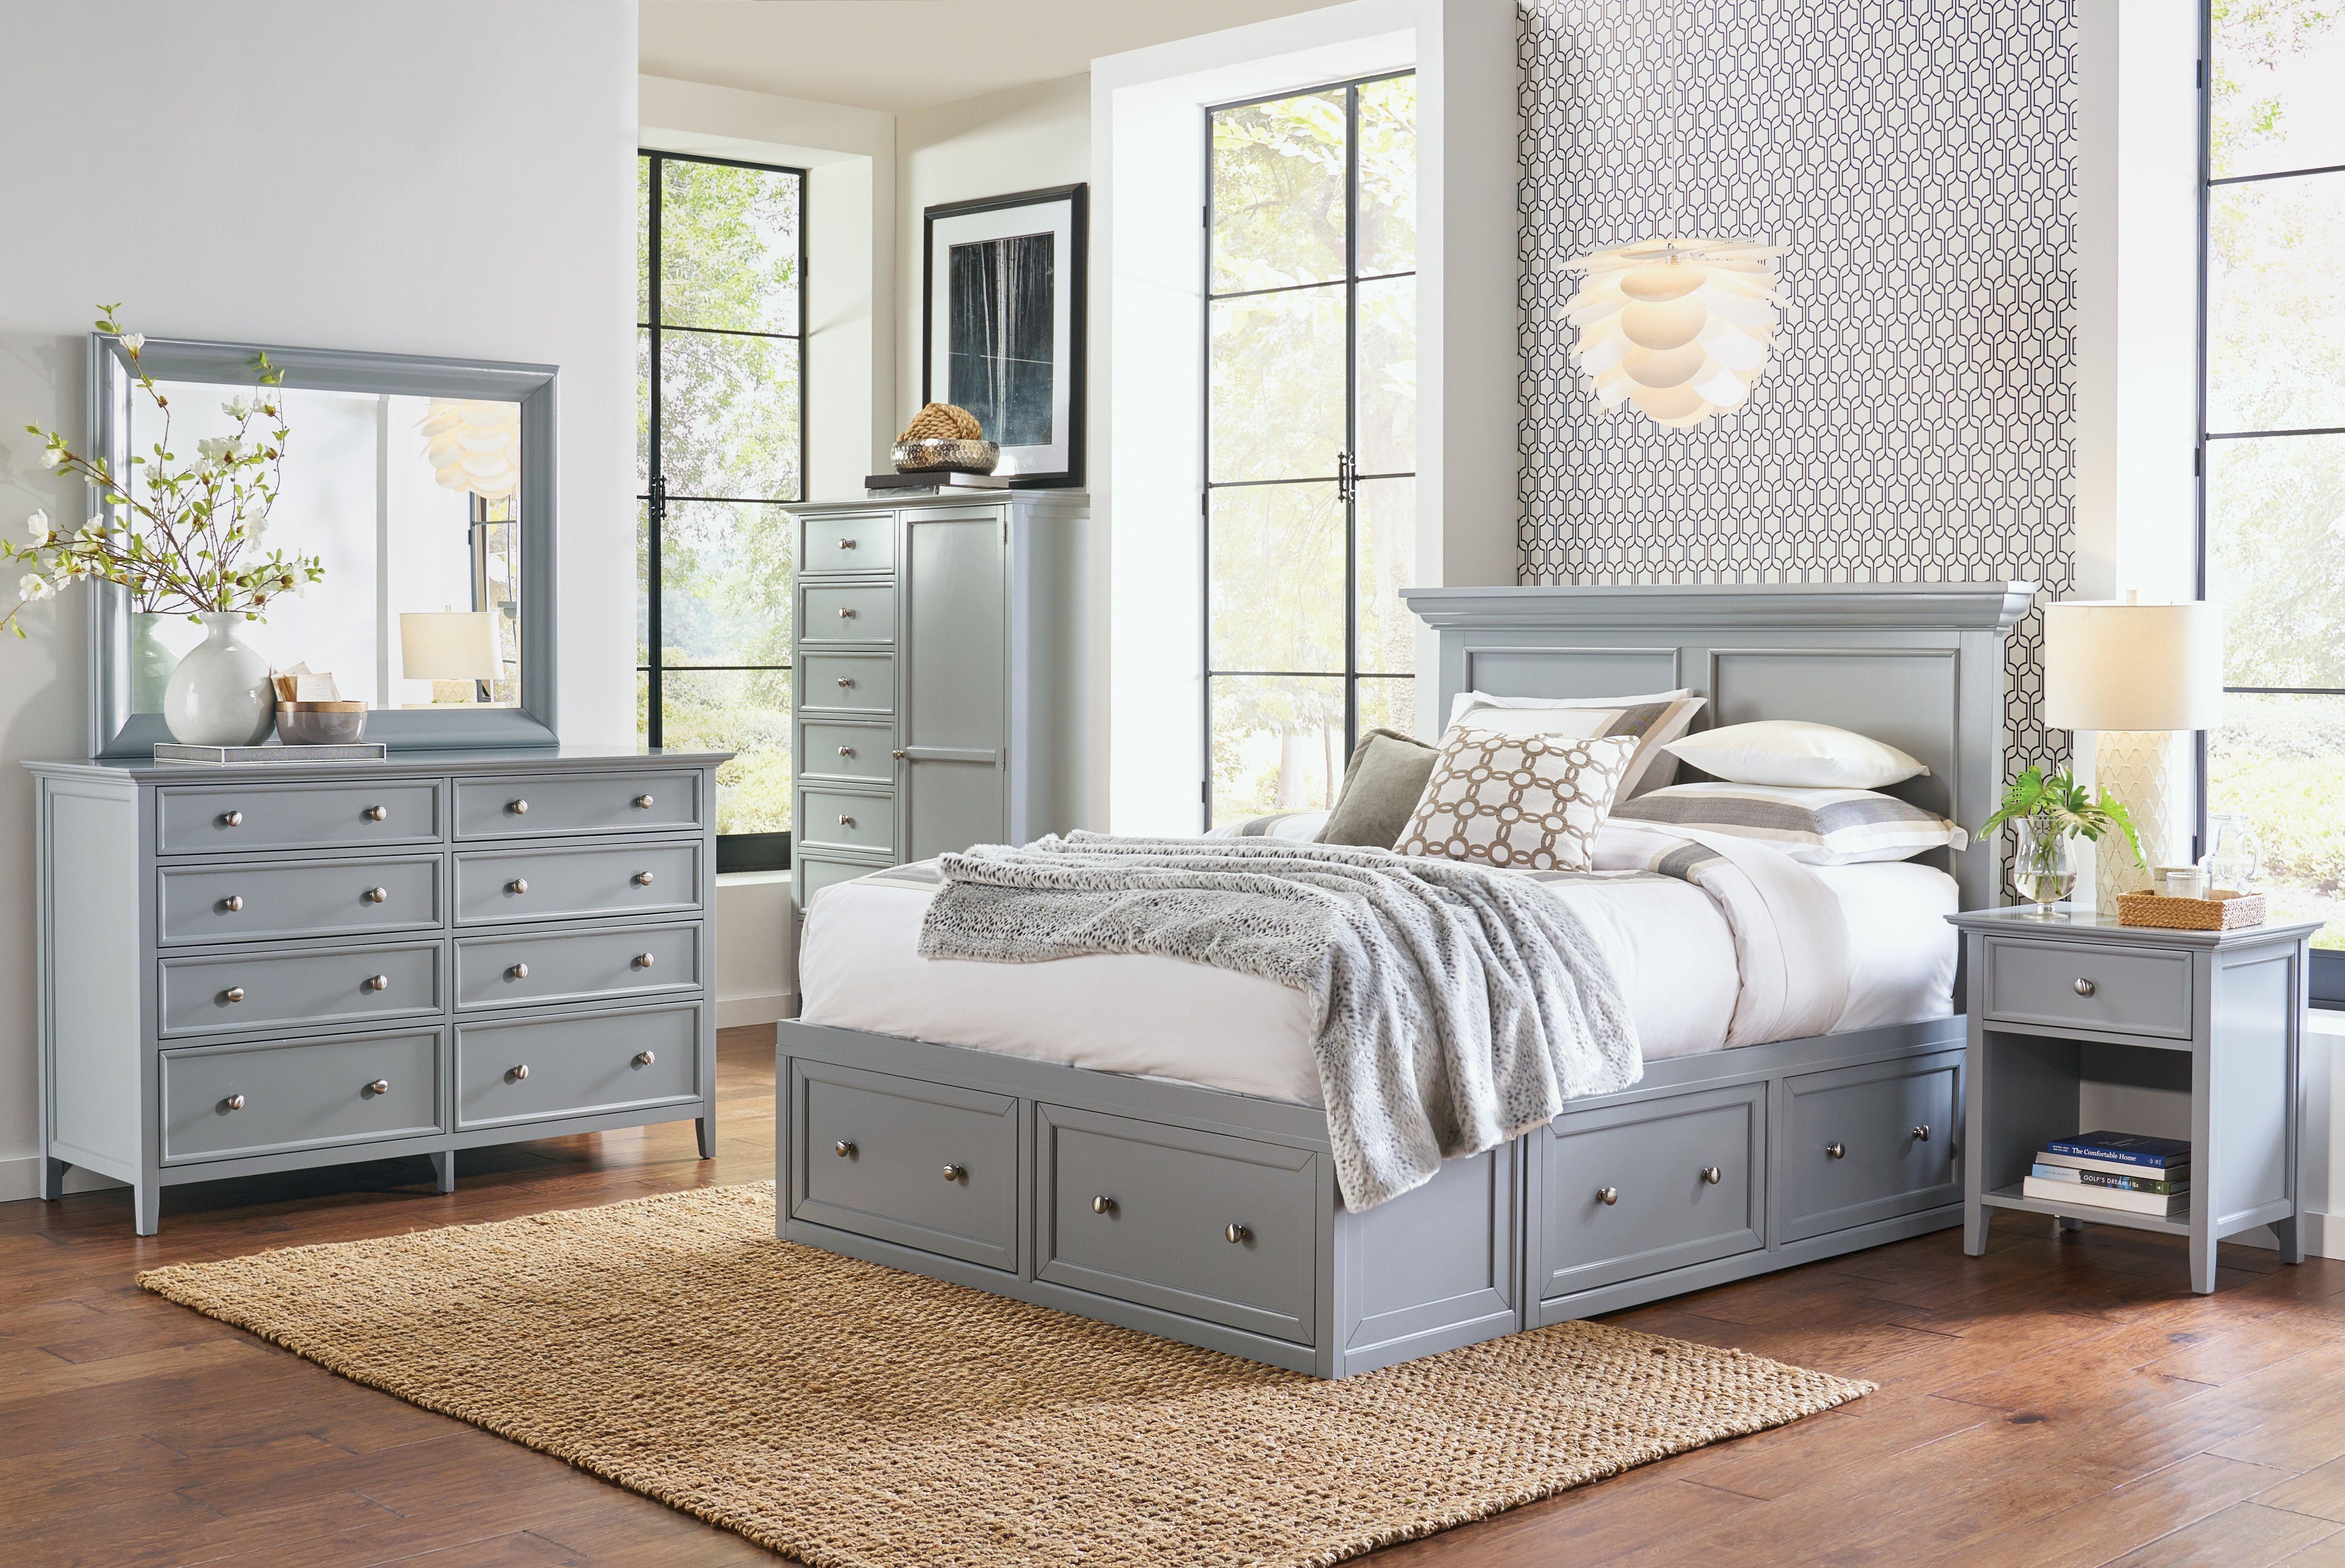 1400 bed, 600 dresser, 300/nightstand levinfurniture